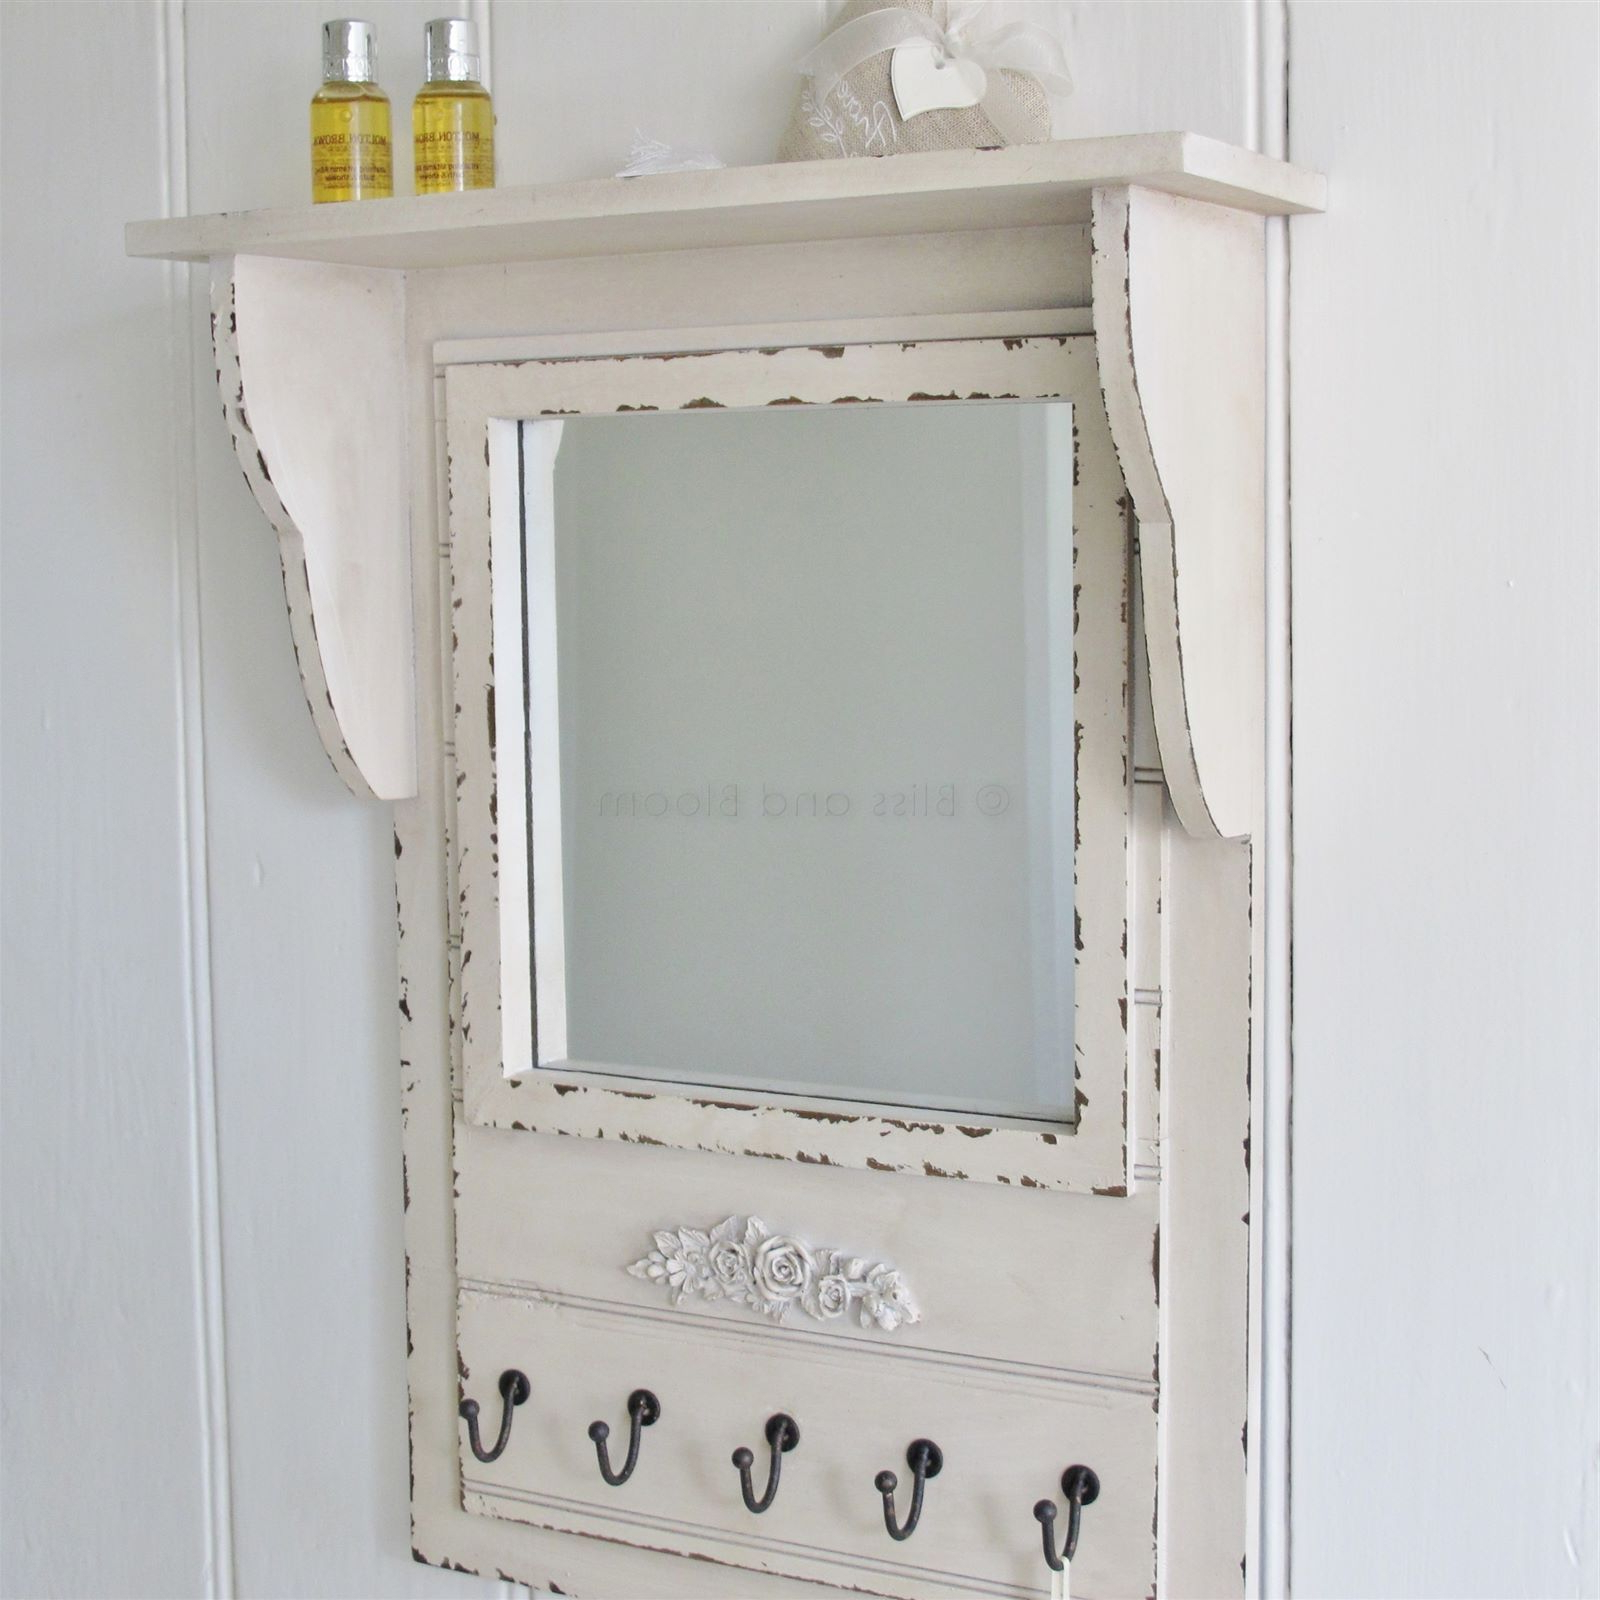 Wall Mirror Shelf Hooks (View 2 of 20)